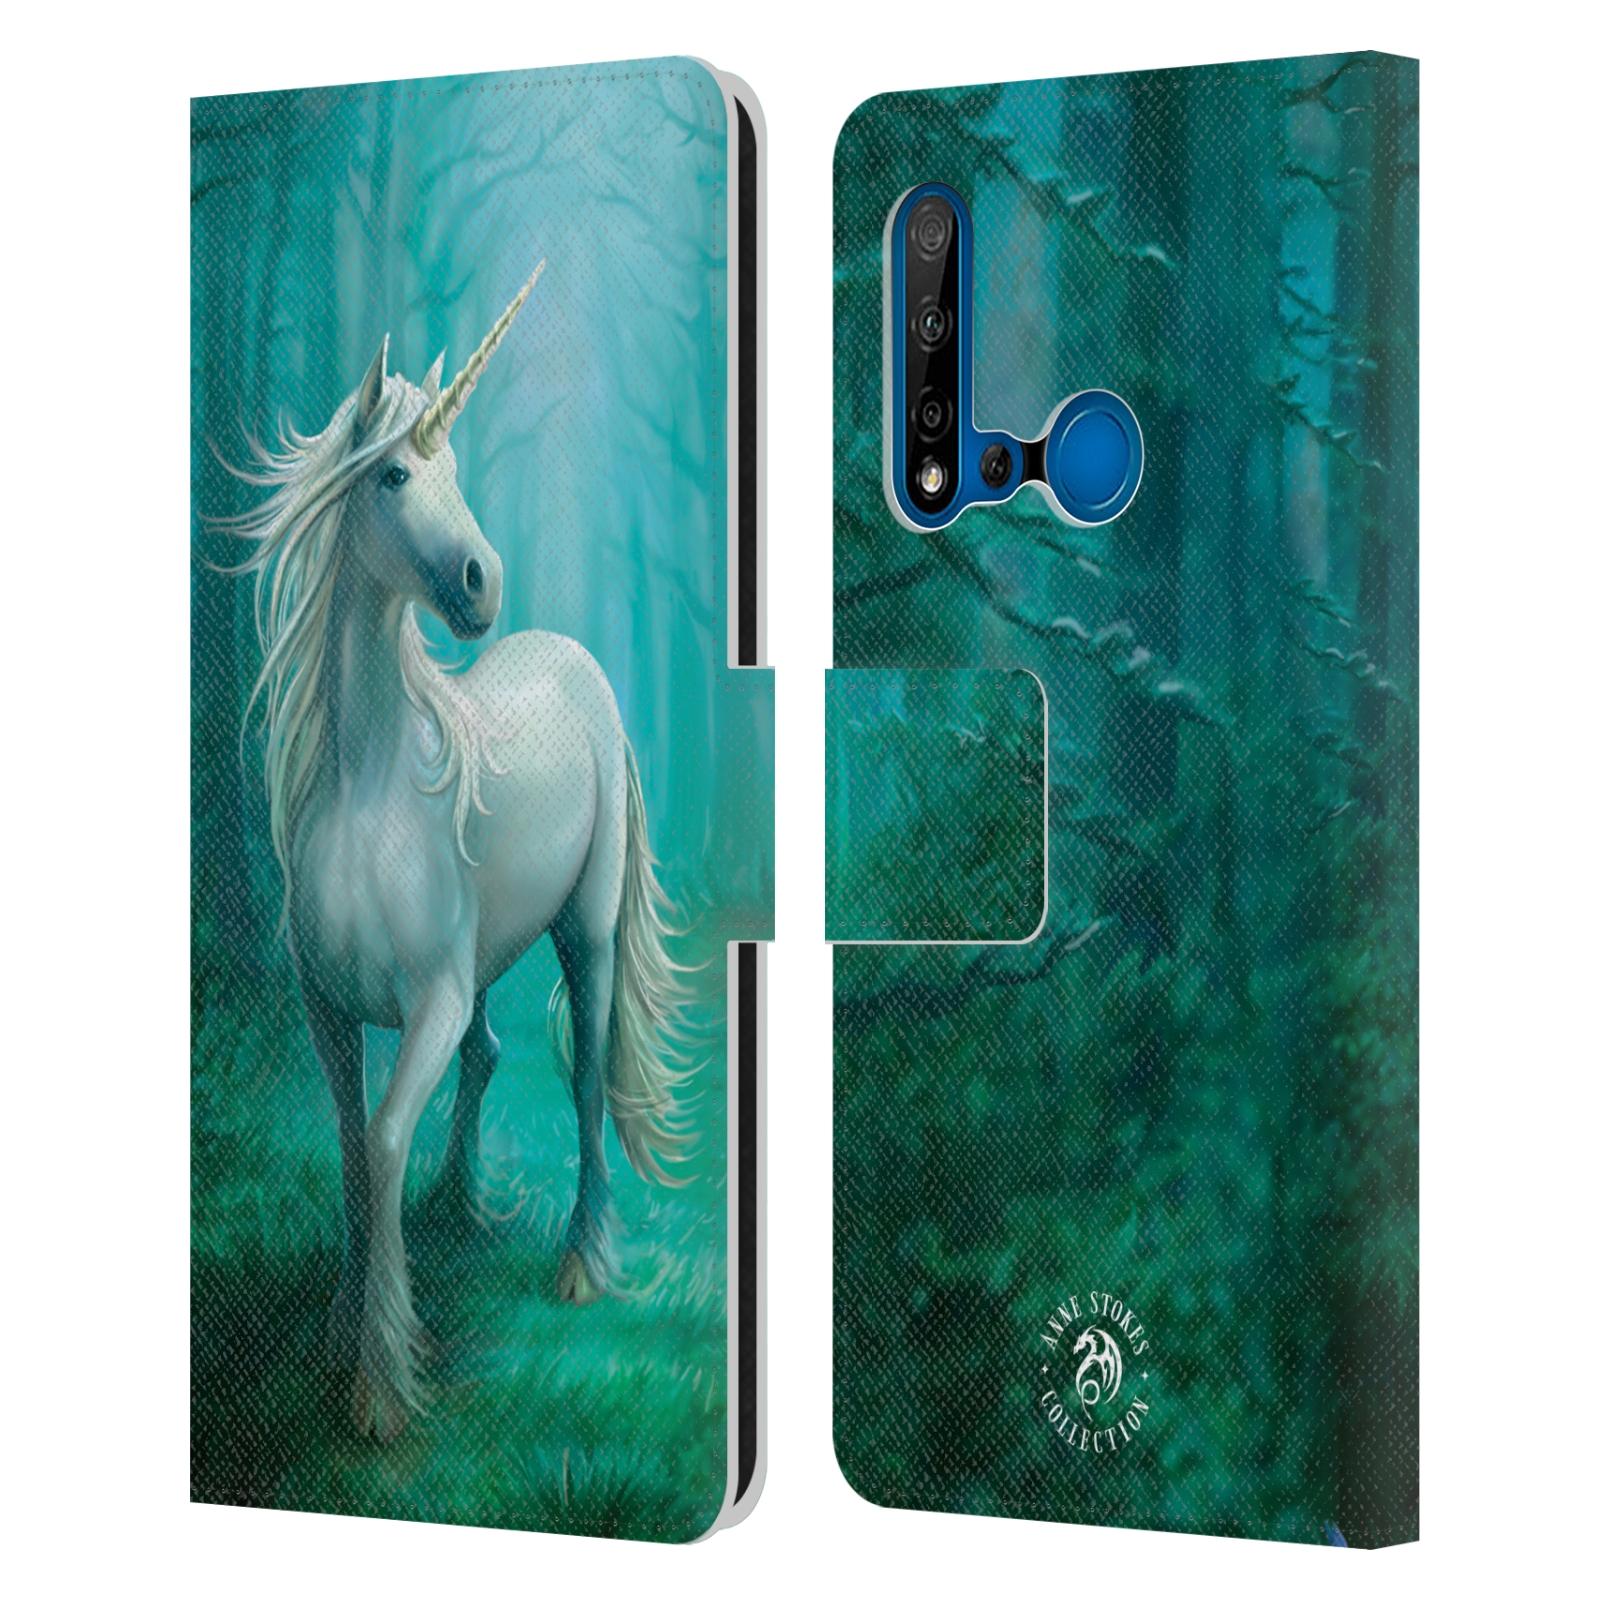 Pouzdro na mobil Huawei P20 LITE 2019 - Head Case - fantasy - jednorožec v lese